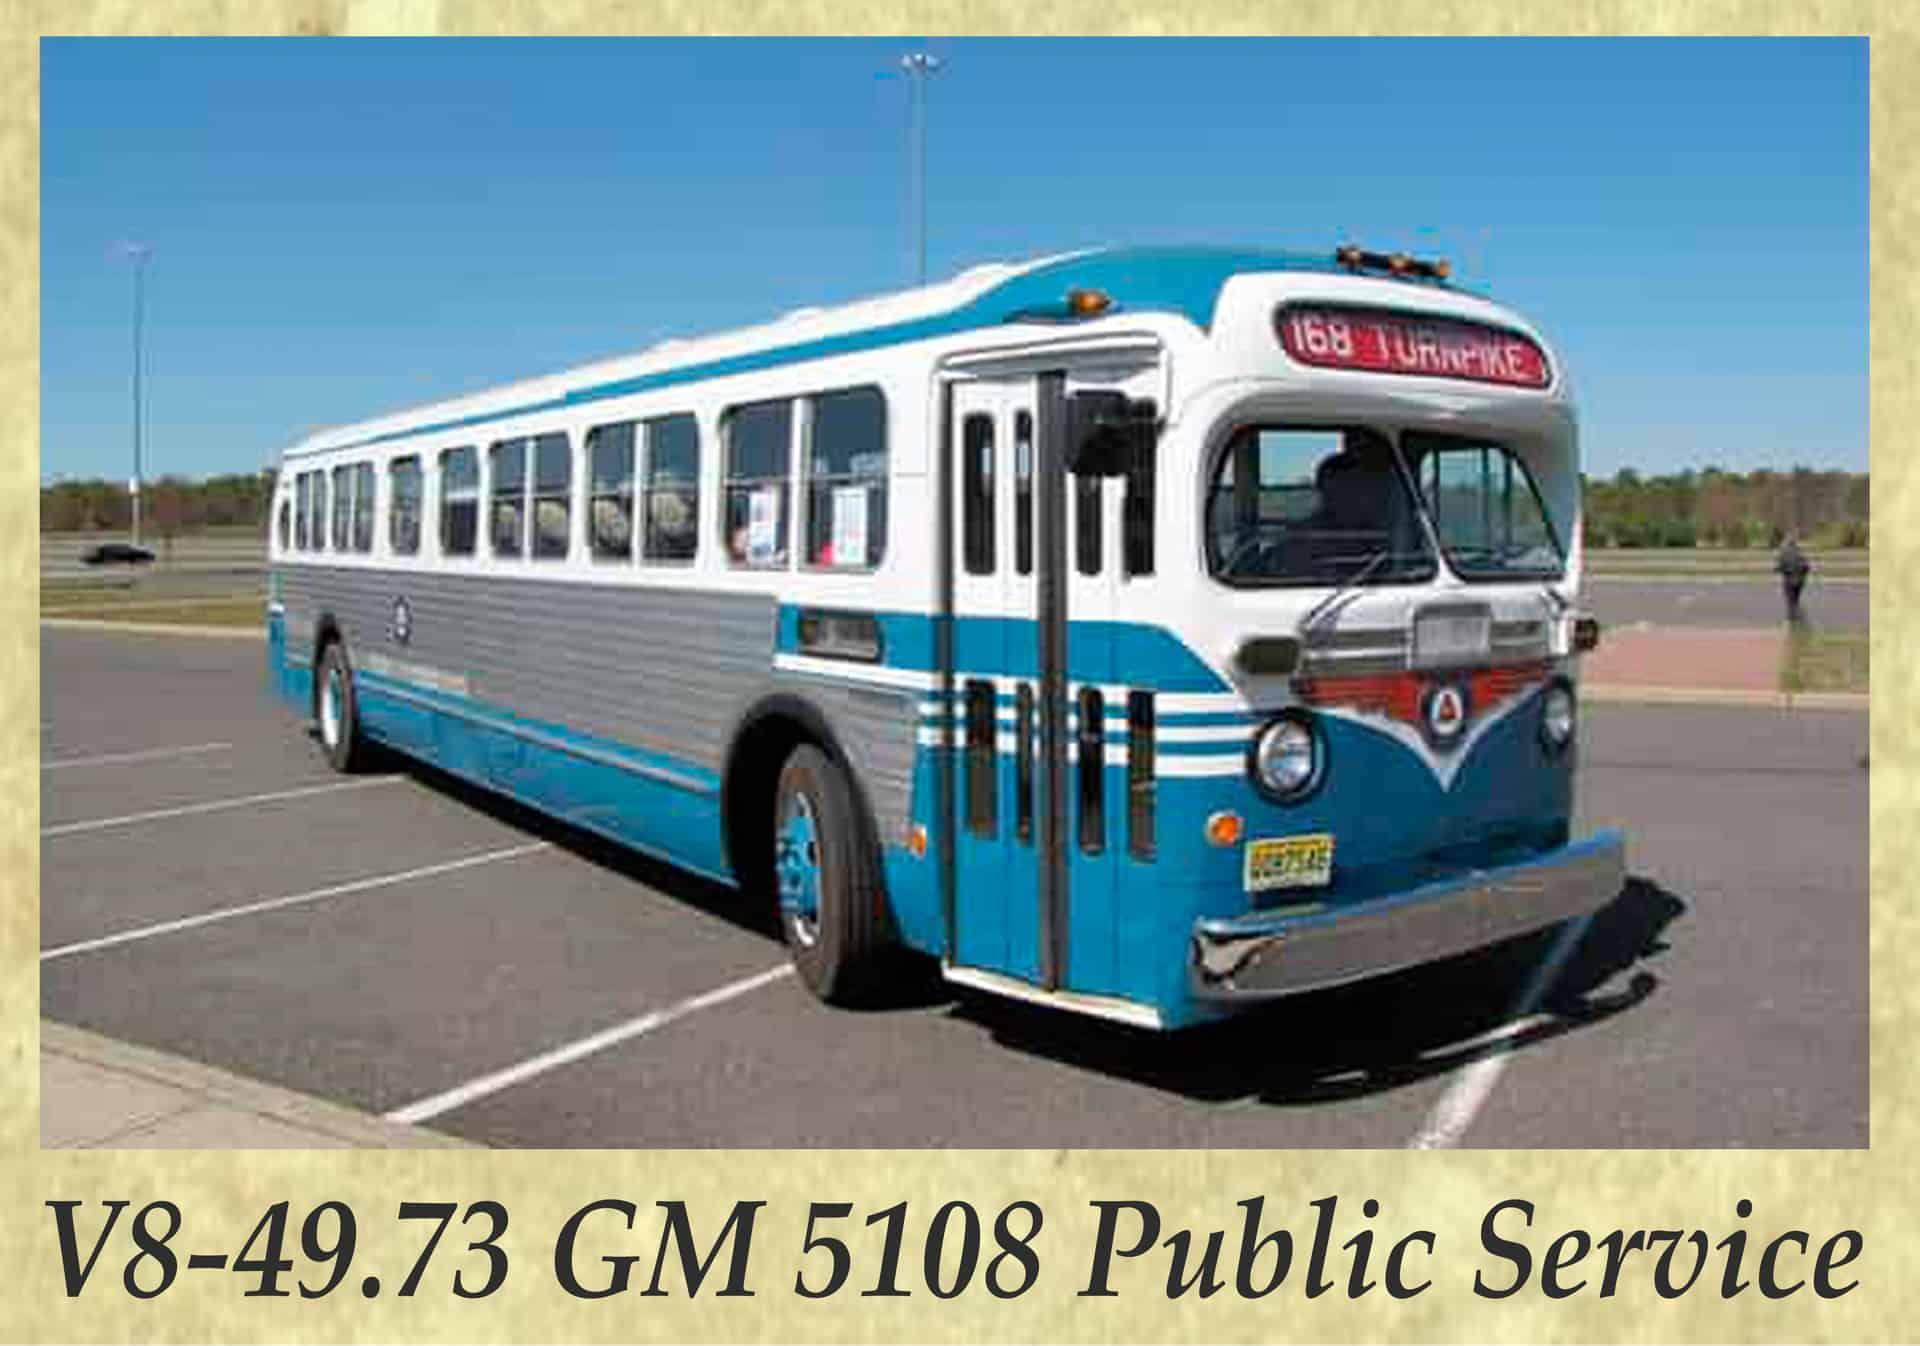 V8-49.73 GM 5108 Public Service